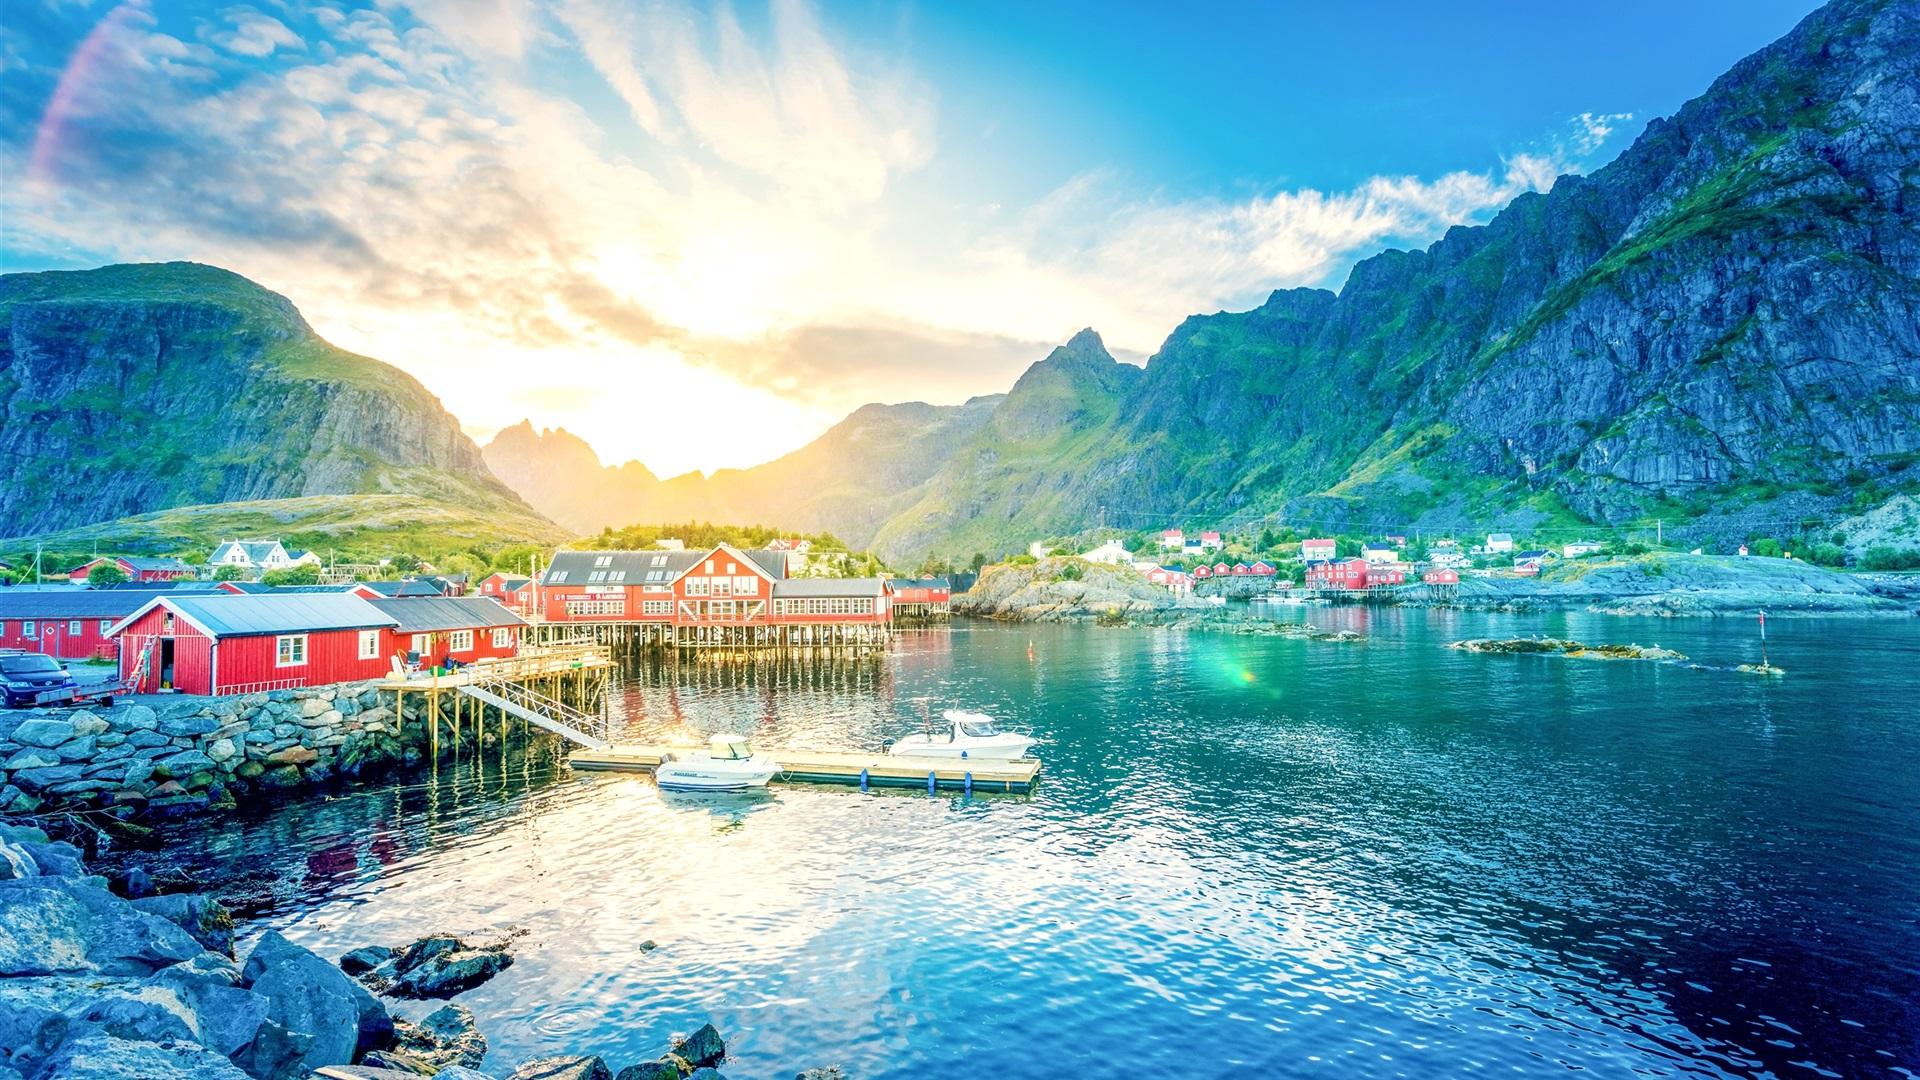 Wallpaper Norway Lofoten Lake Mountains Gorge Sunrise Town Houses Pier Boat 2560x1600 Hd Picture Image